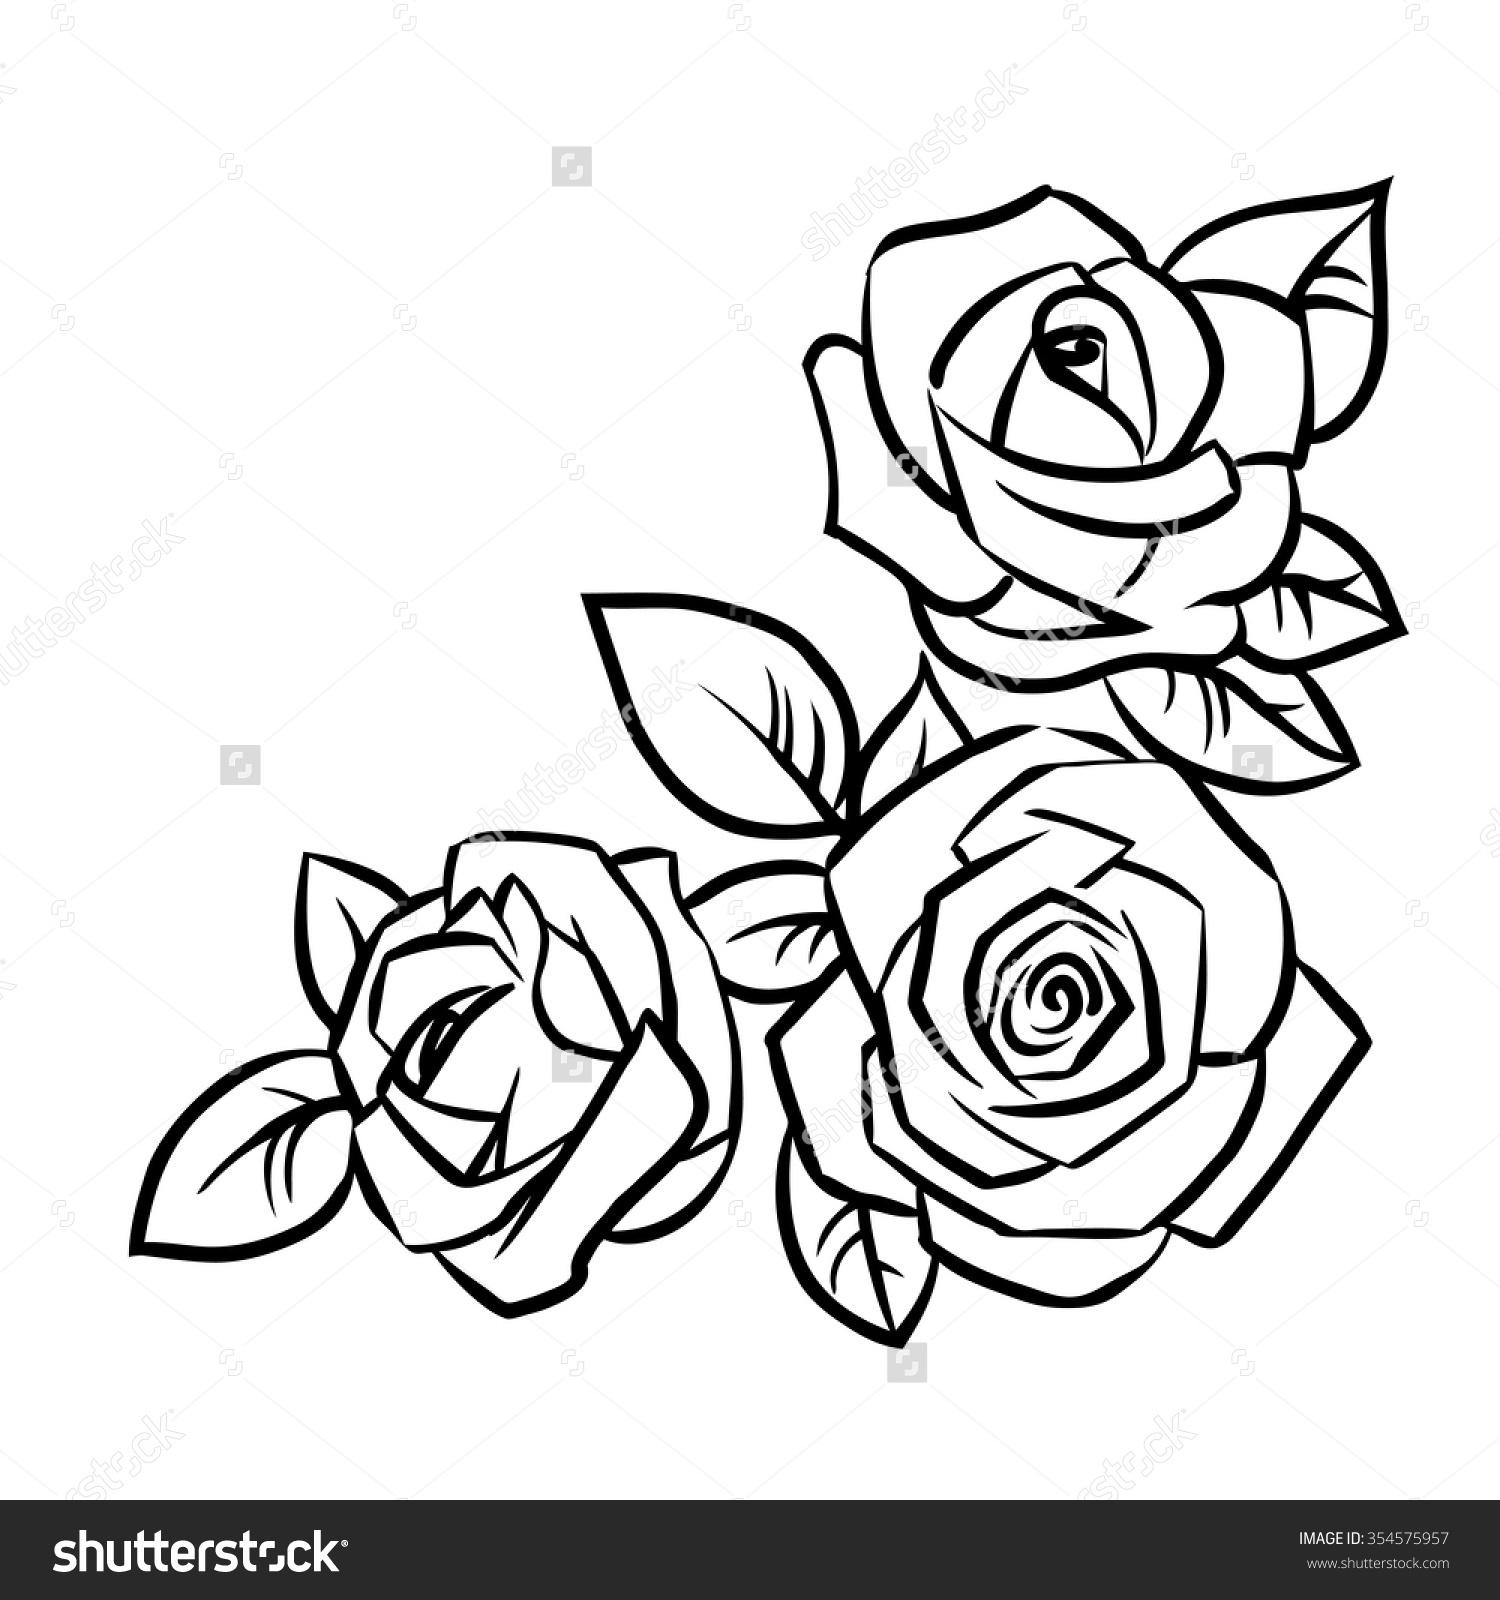 1500x1600 Rose Flower Outline Drawing Free Outline Flower Vector Design